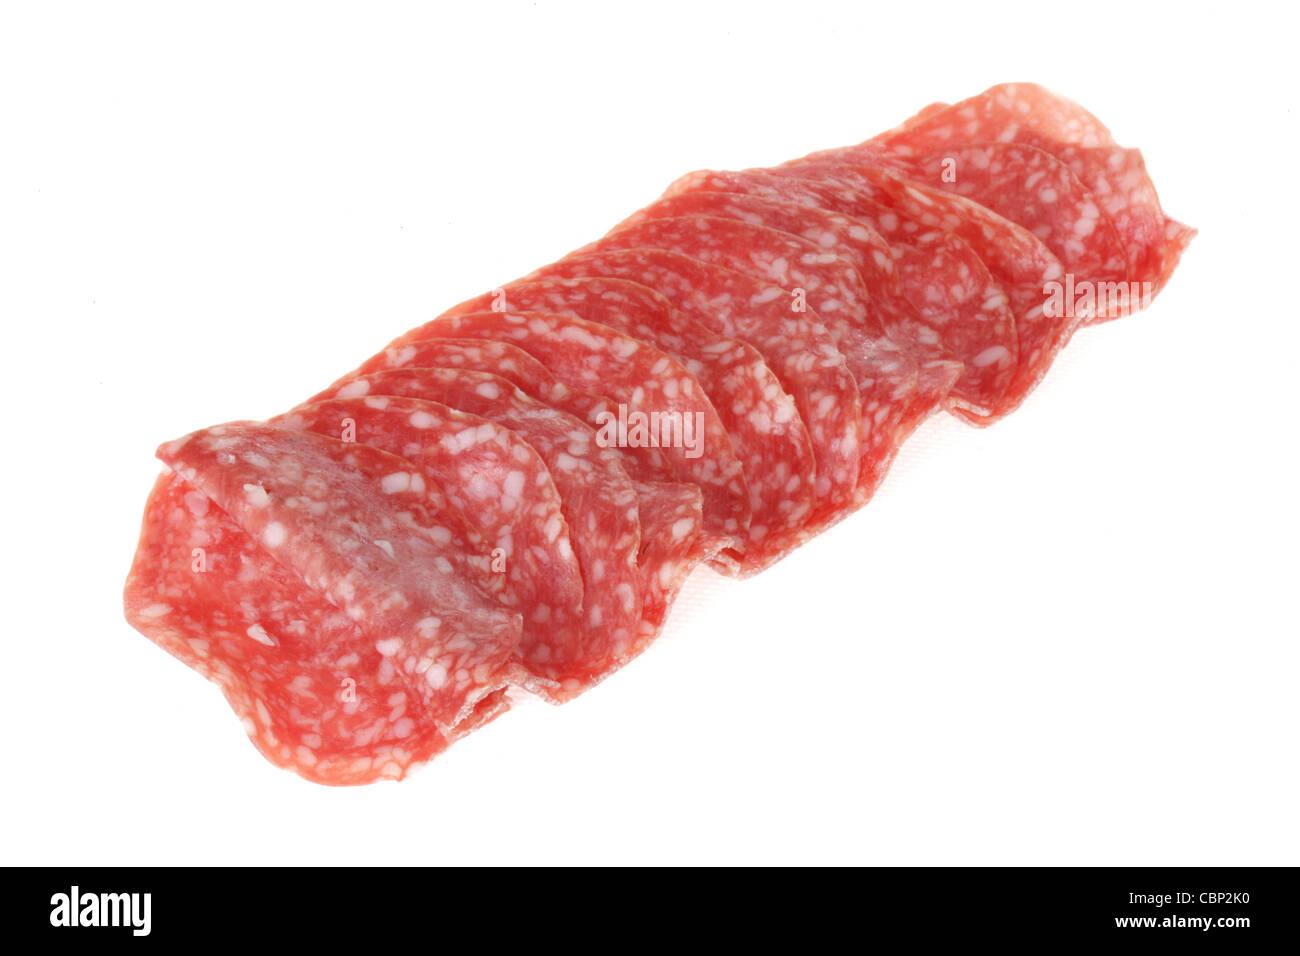 Salami - Stock Image